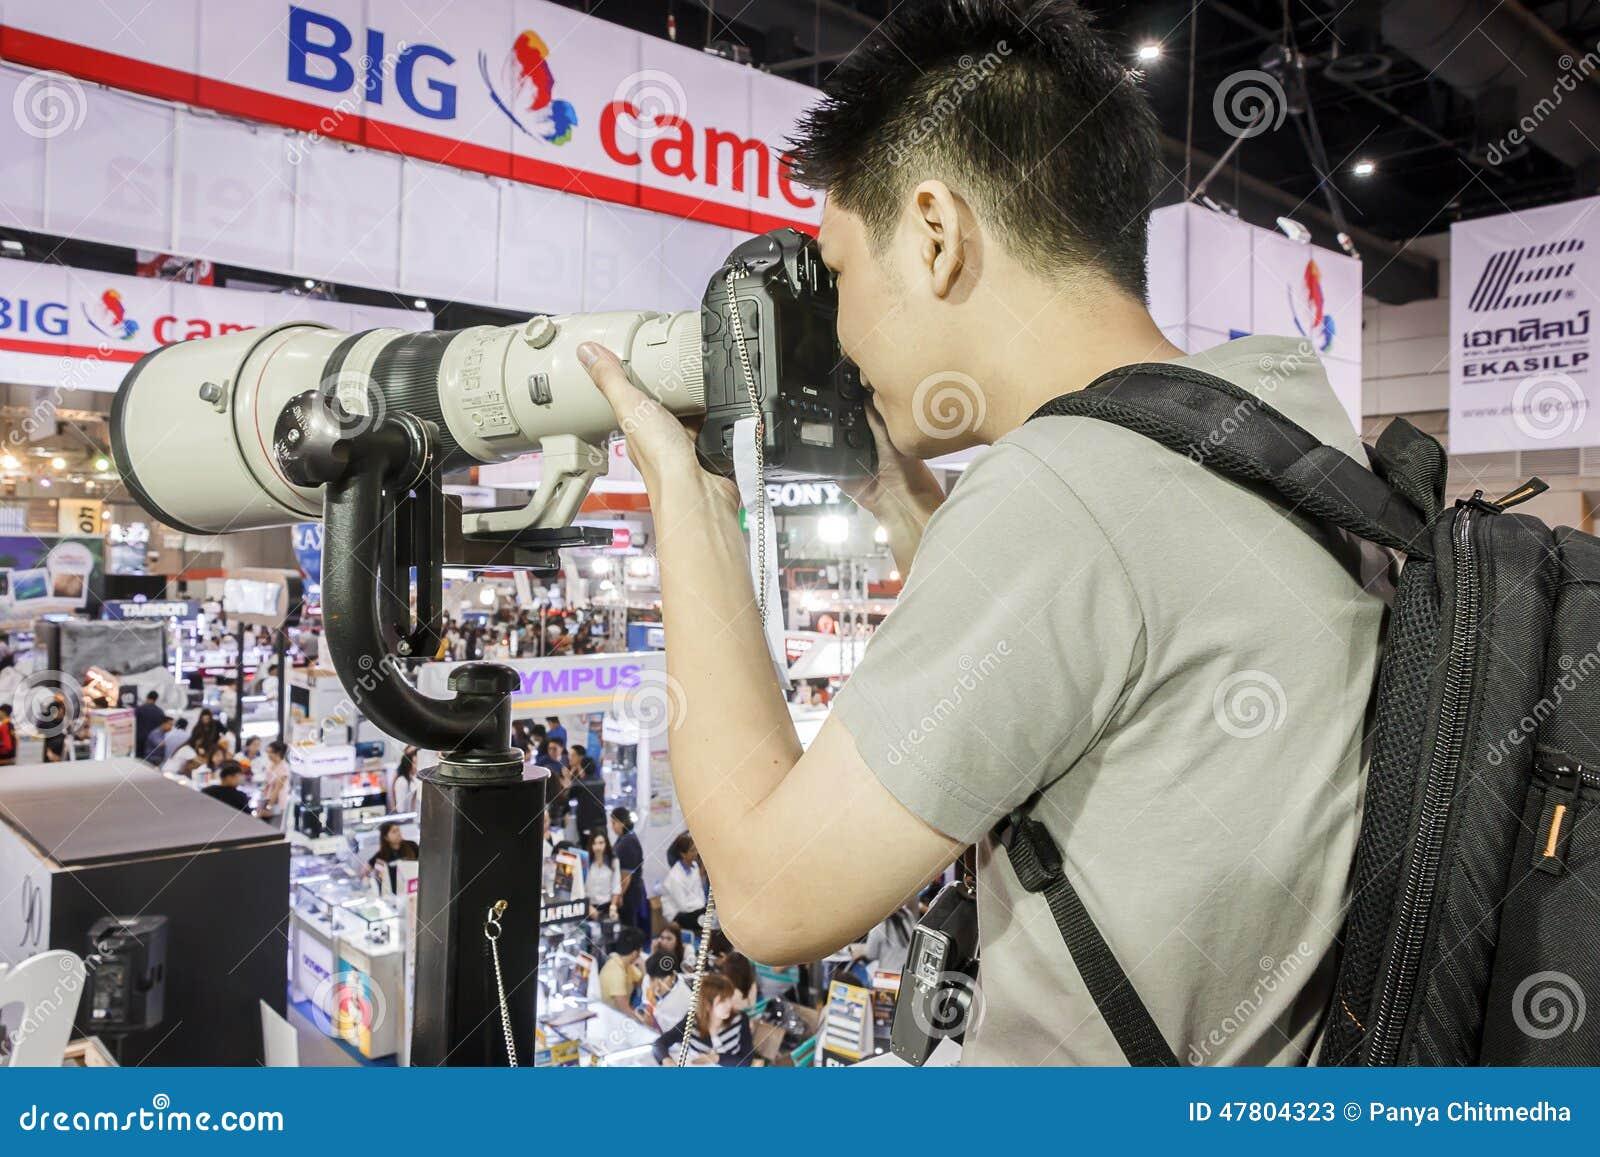 Testing camera and tele len